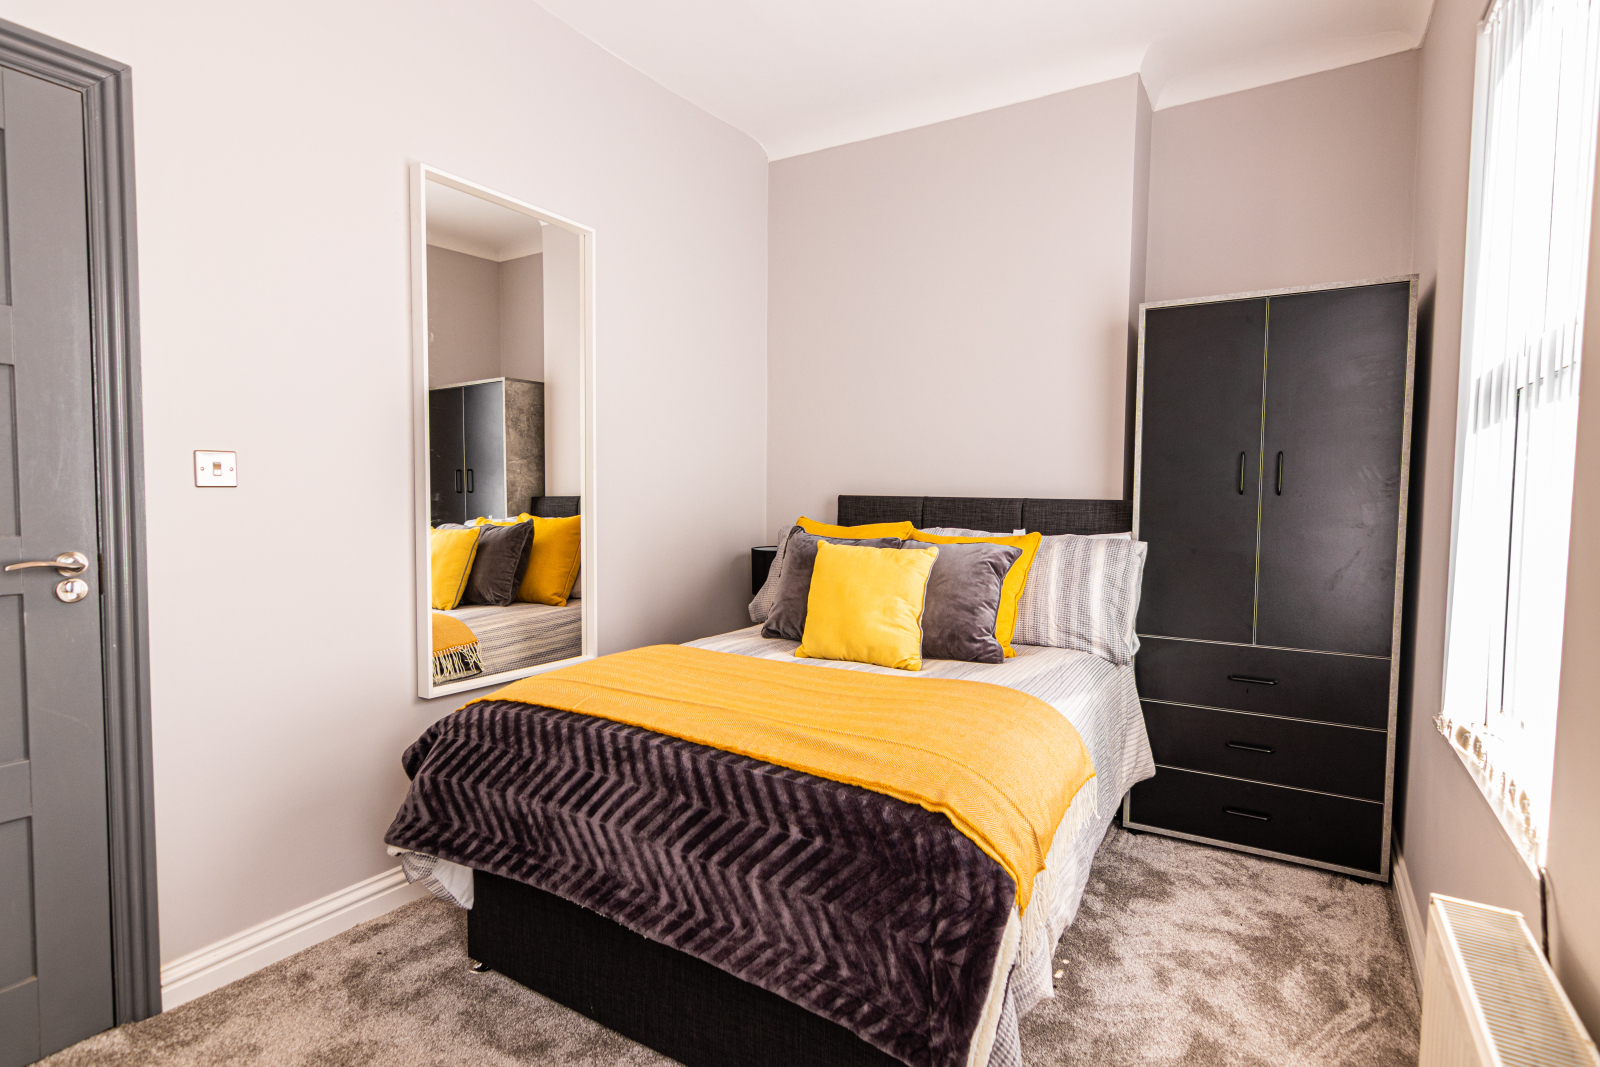 4 Bedroom House Kensington - Caro Lettings